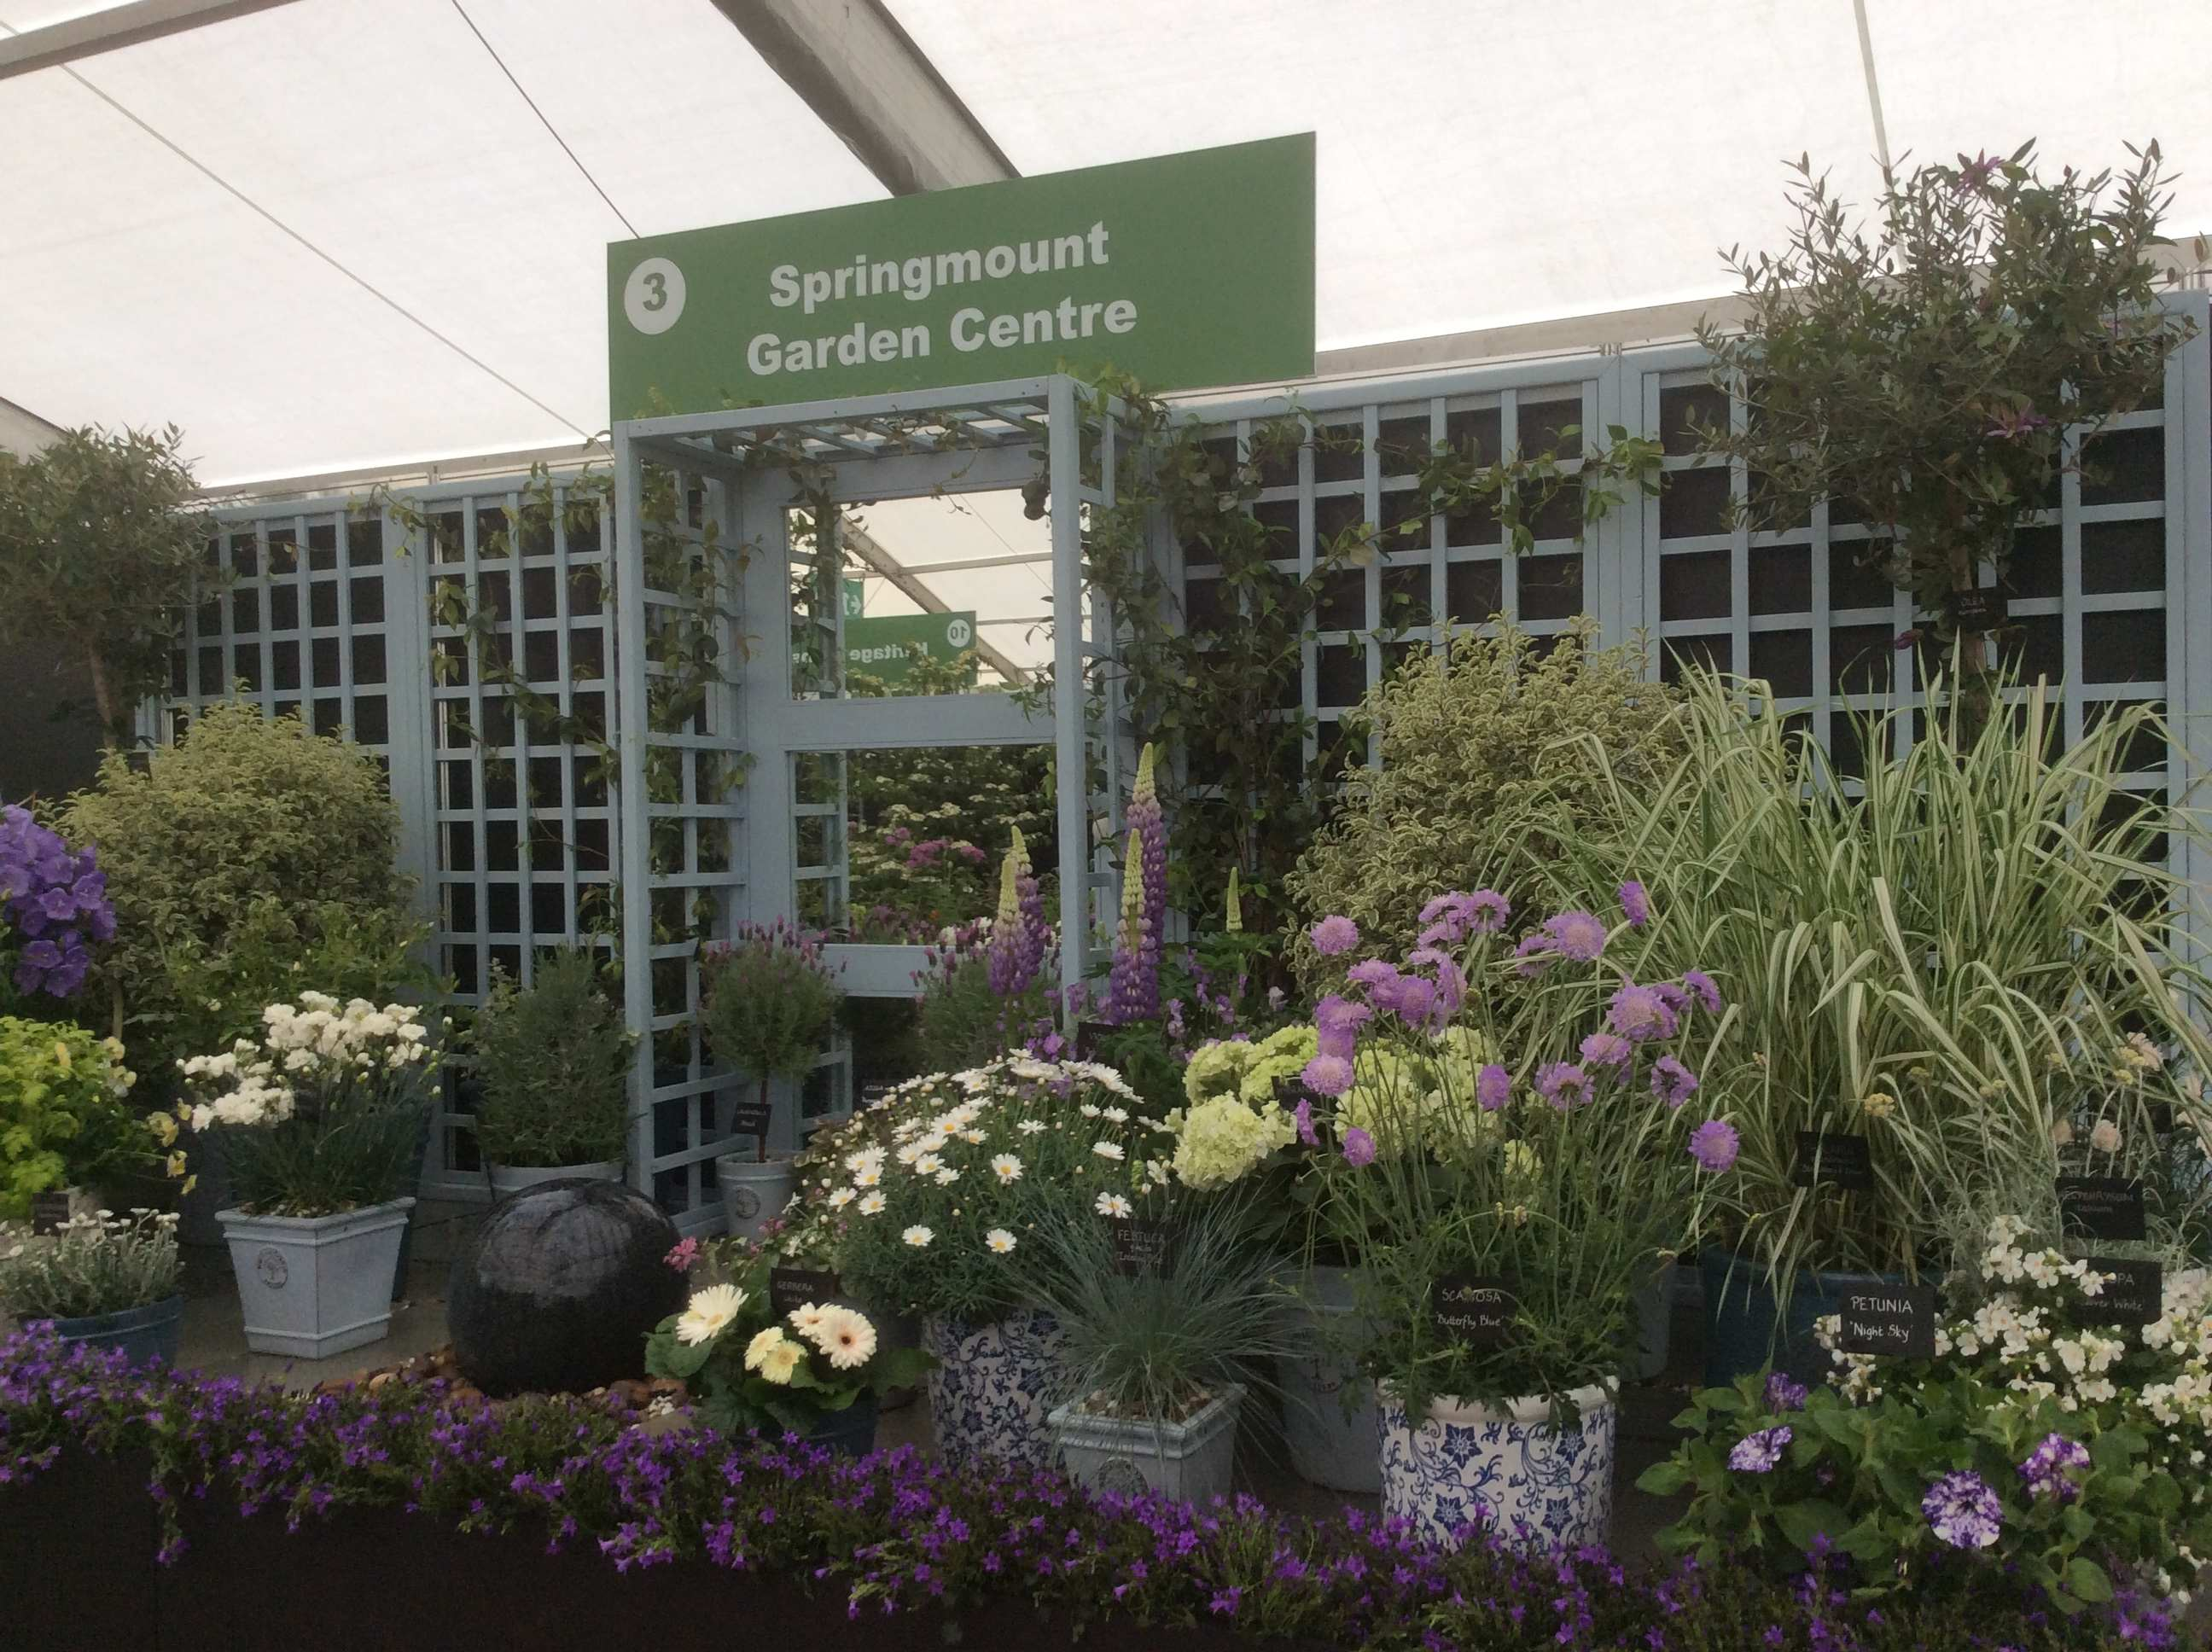 Blooms Garden Centre: Bloom In The Park 2017